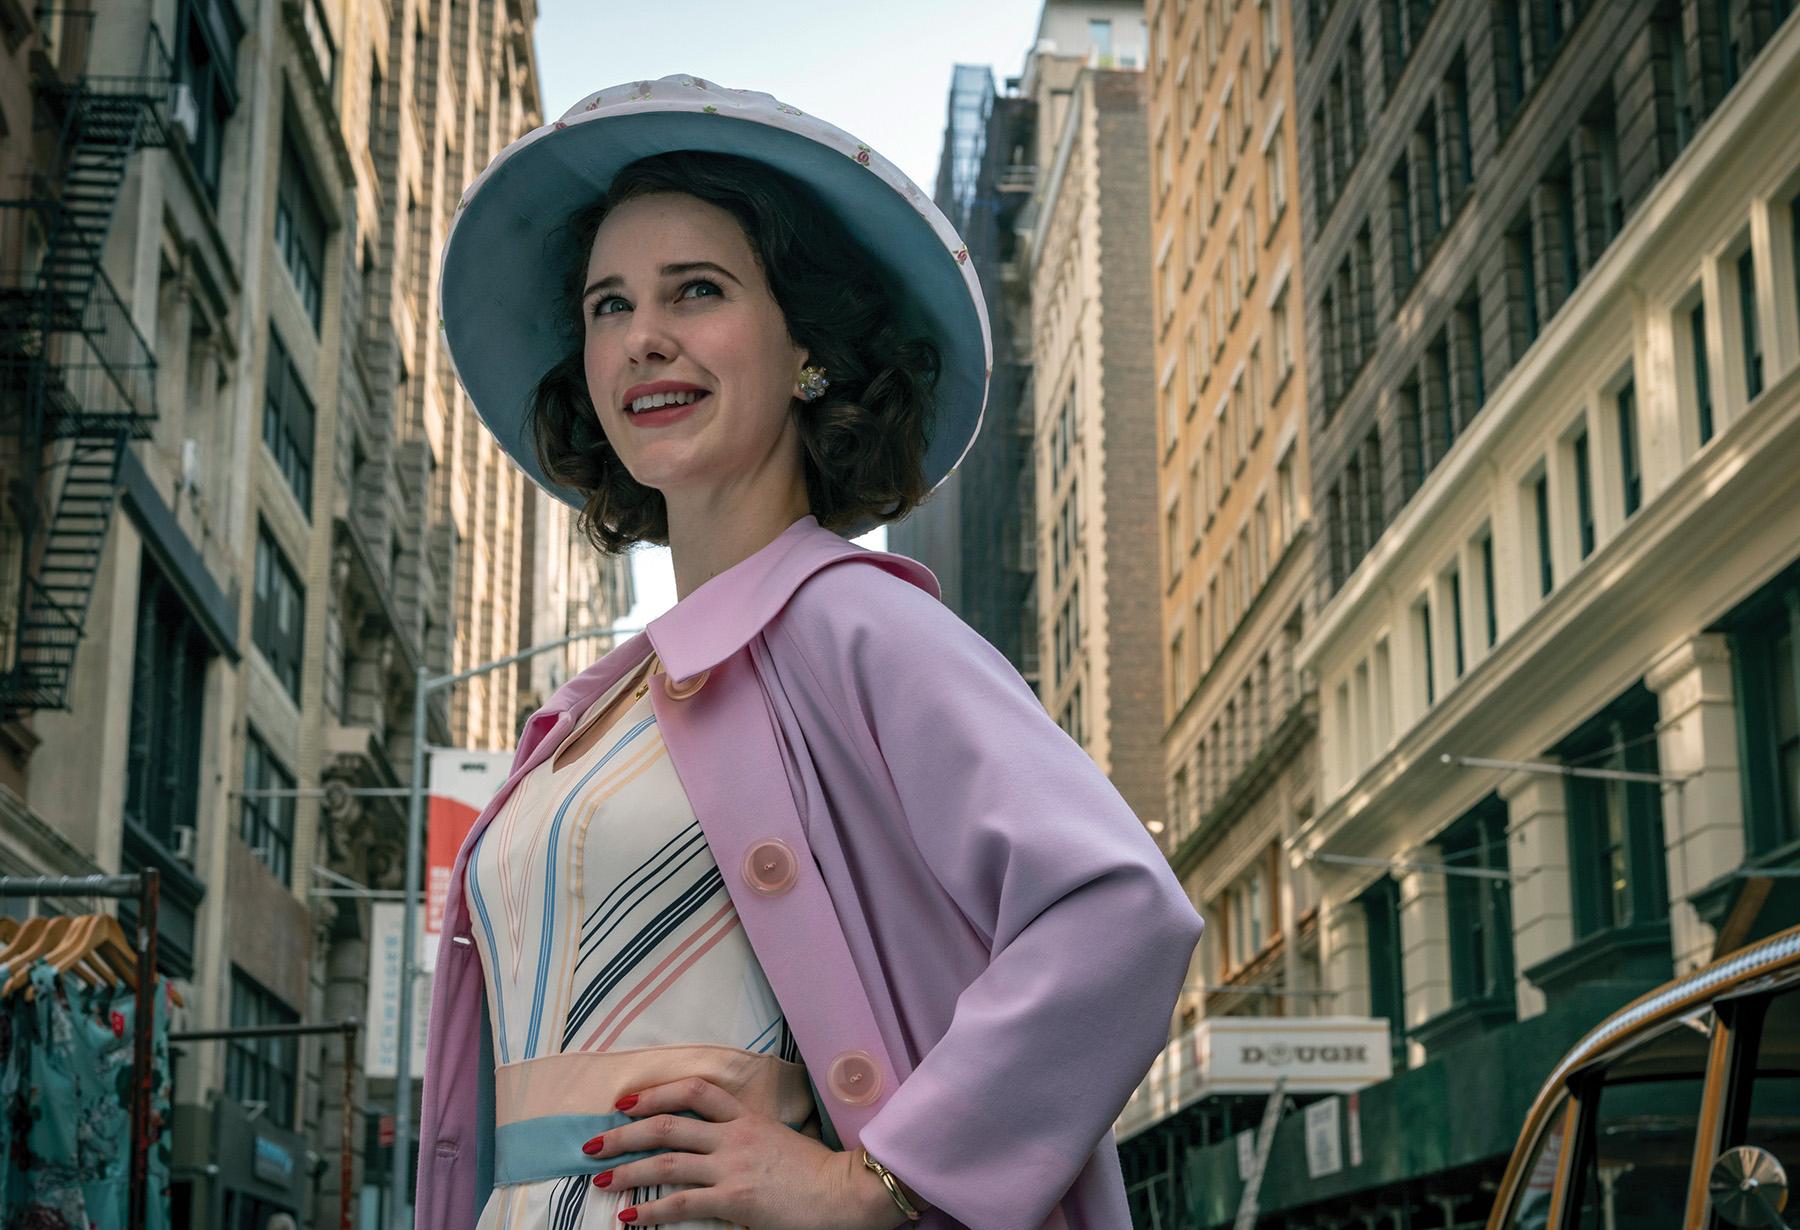 Rachel Brosnahan as Midge Maisel. Courtesy of Tiffany Shinn via Amazon Studios